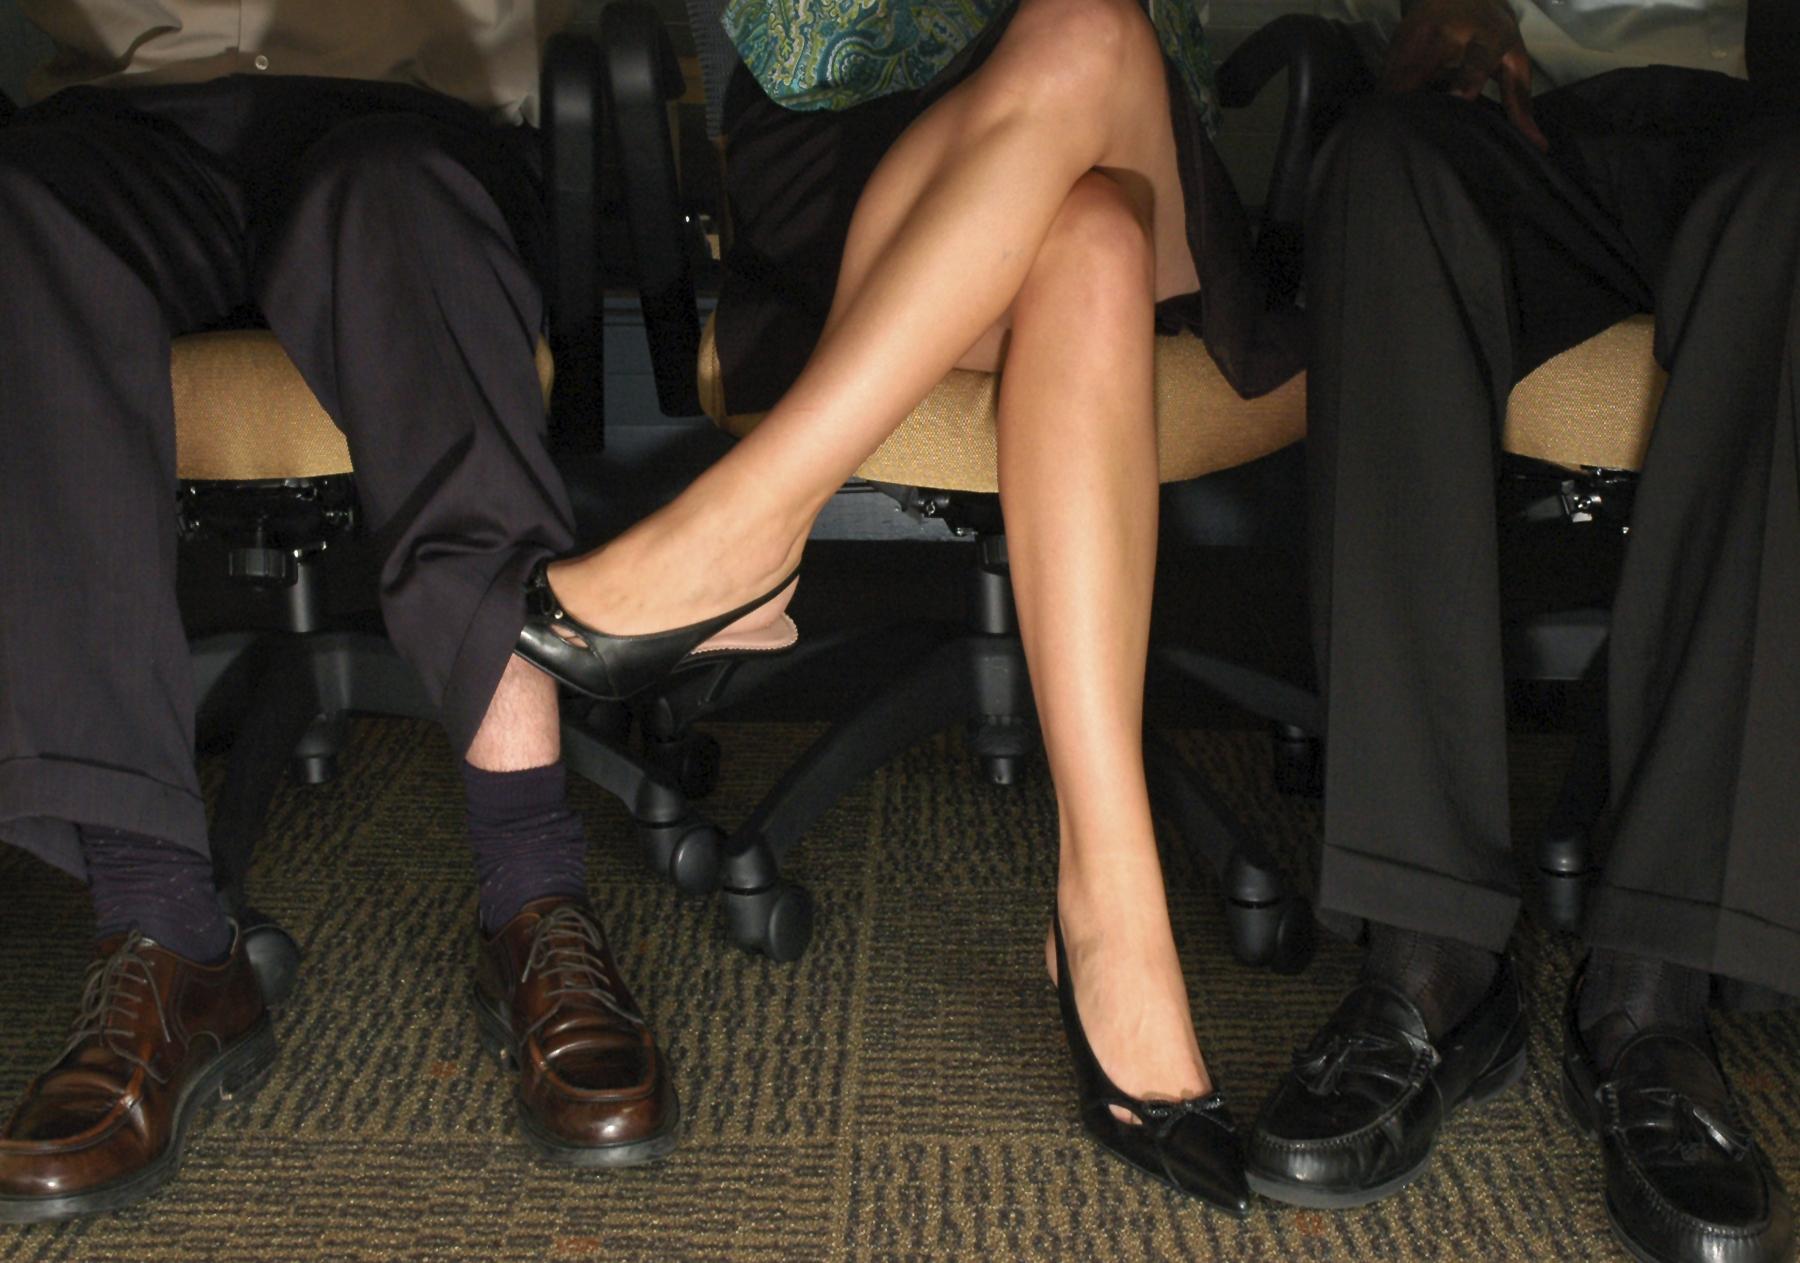 Фото на работе под столом, Девушка в чулках мастурбирует на работе под столом 2 фотография